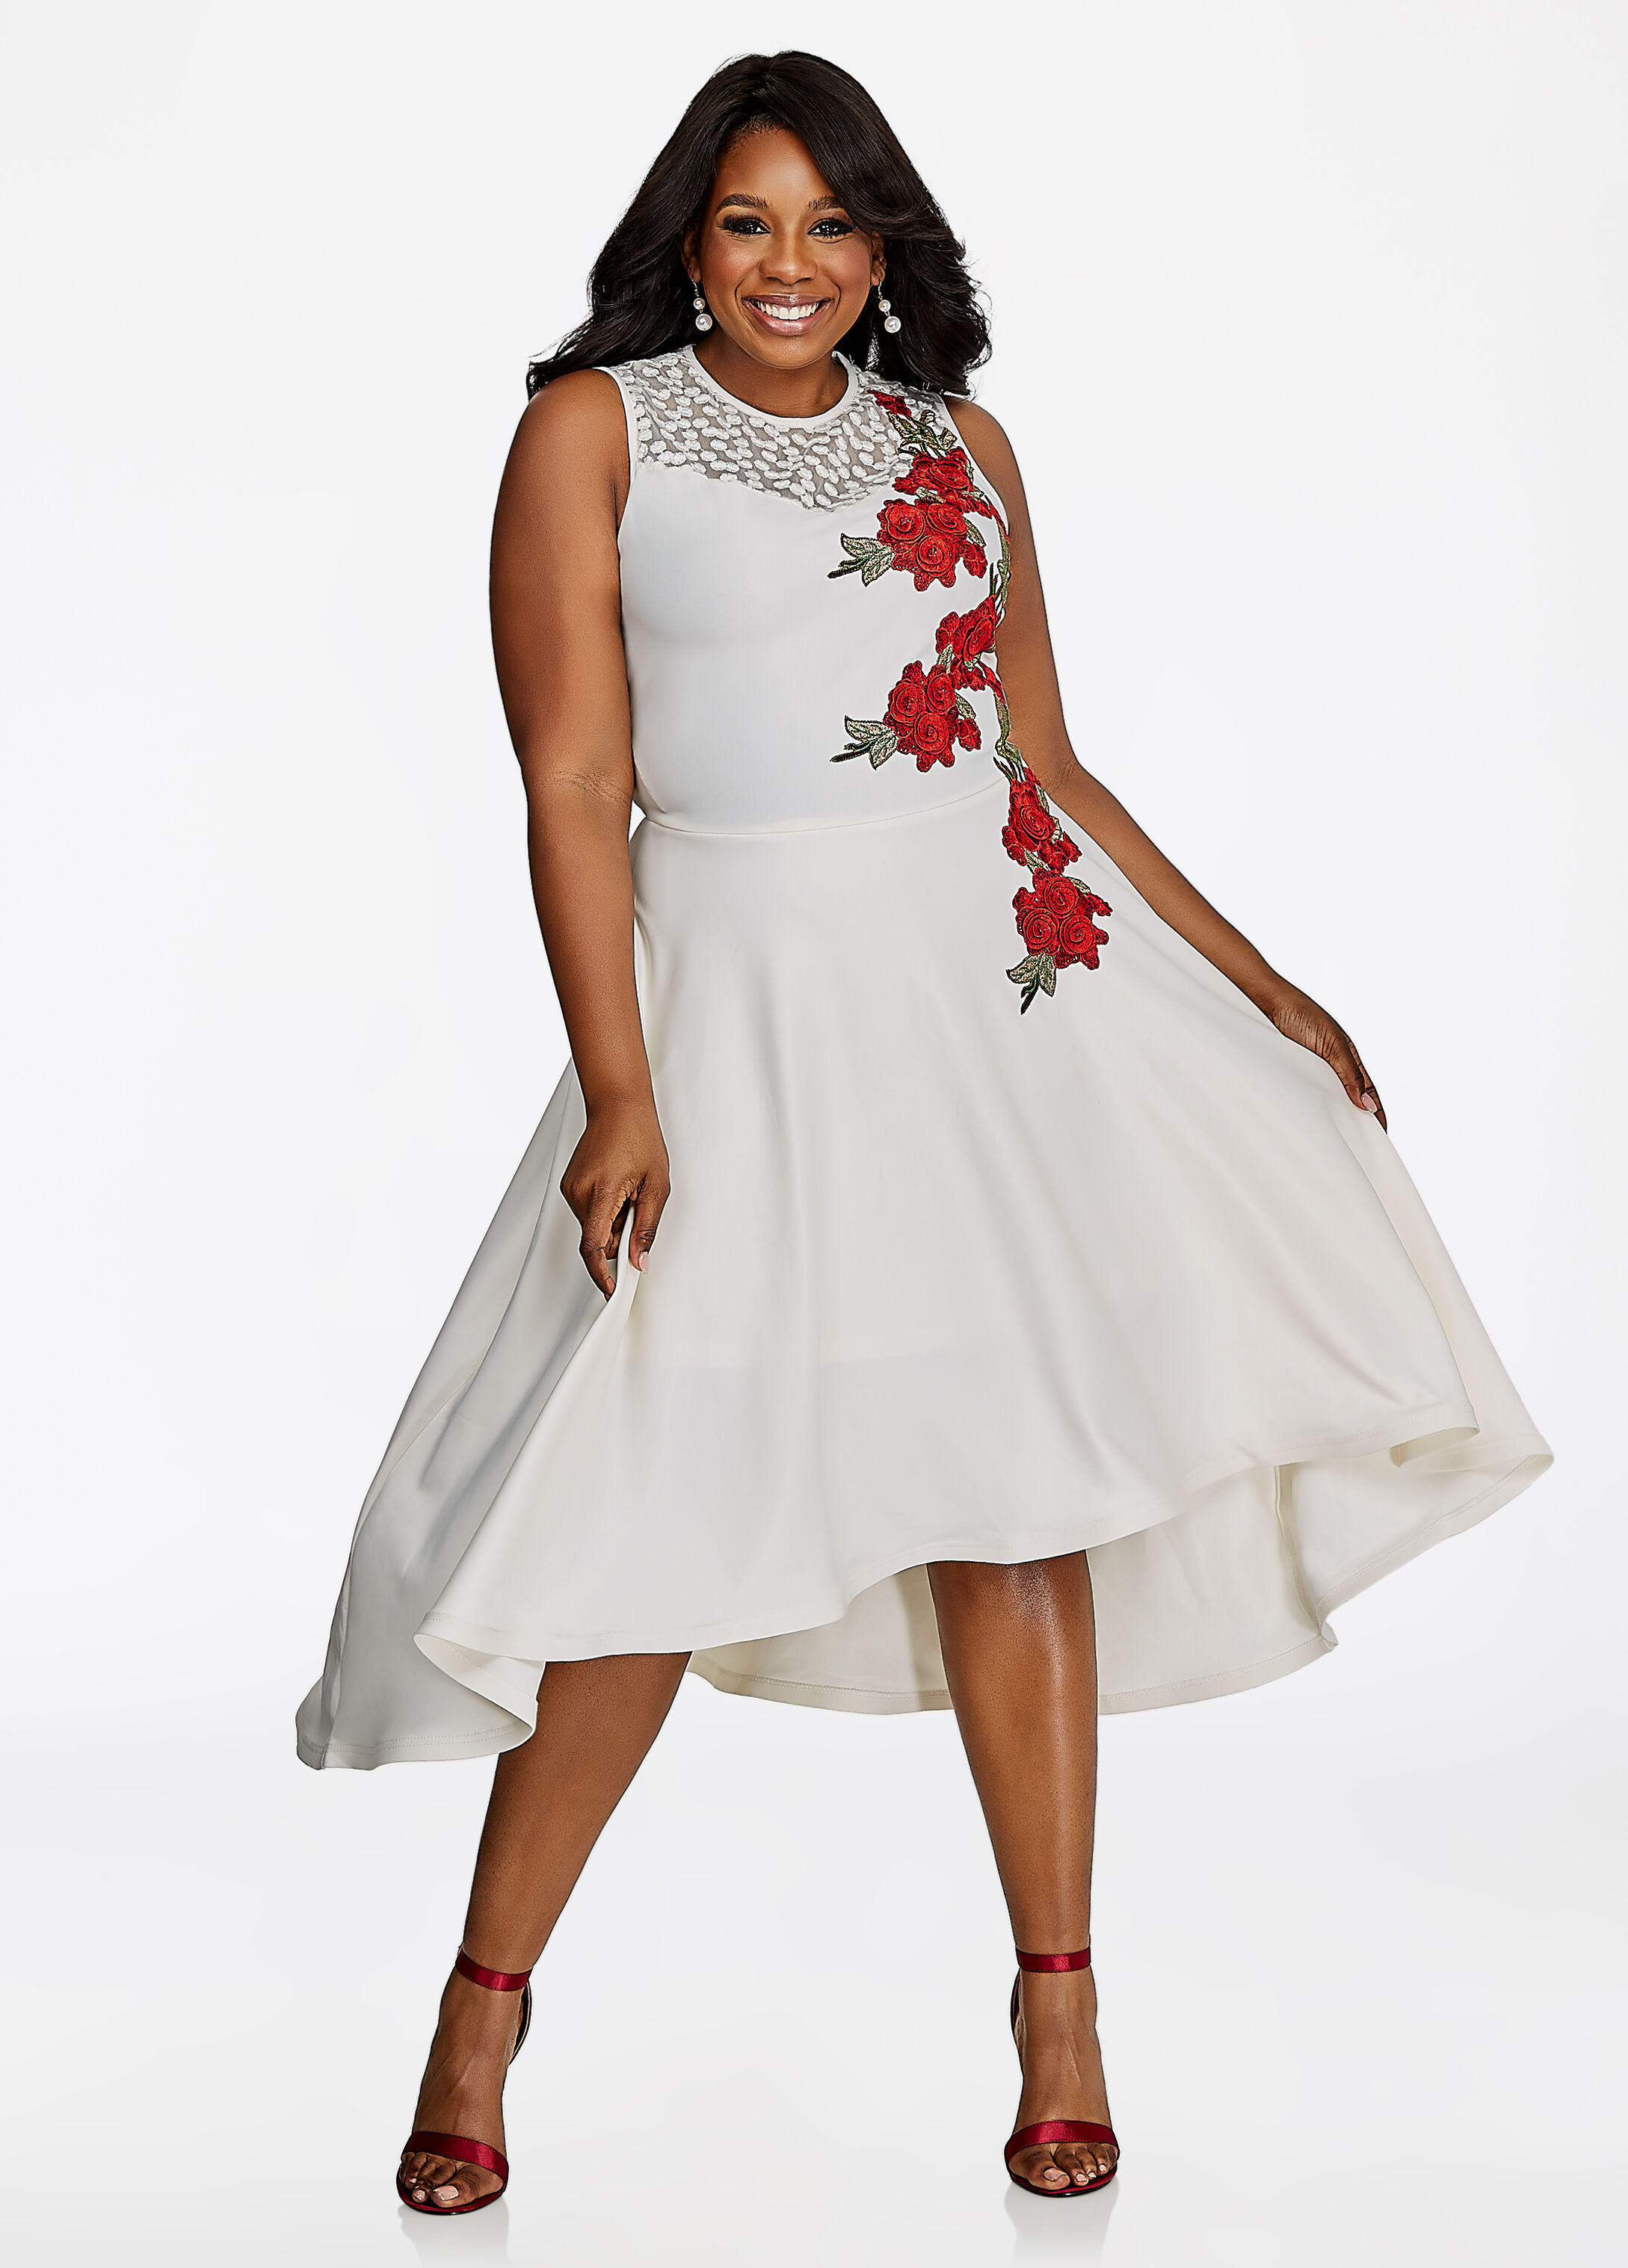 clearance: plus-size dresses on sale | ashley stewart